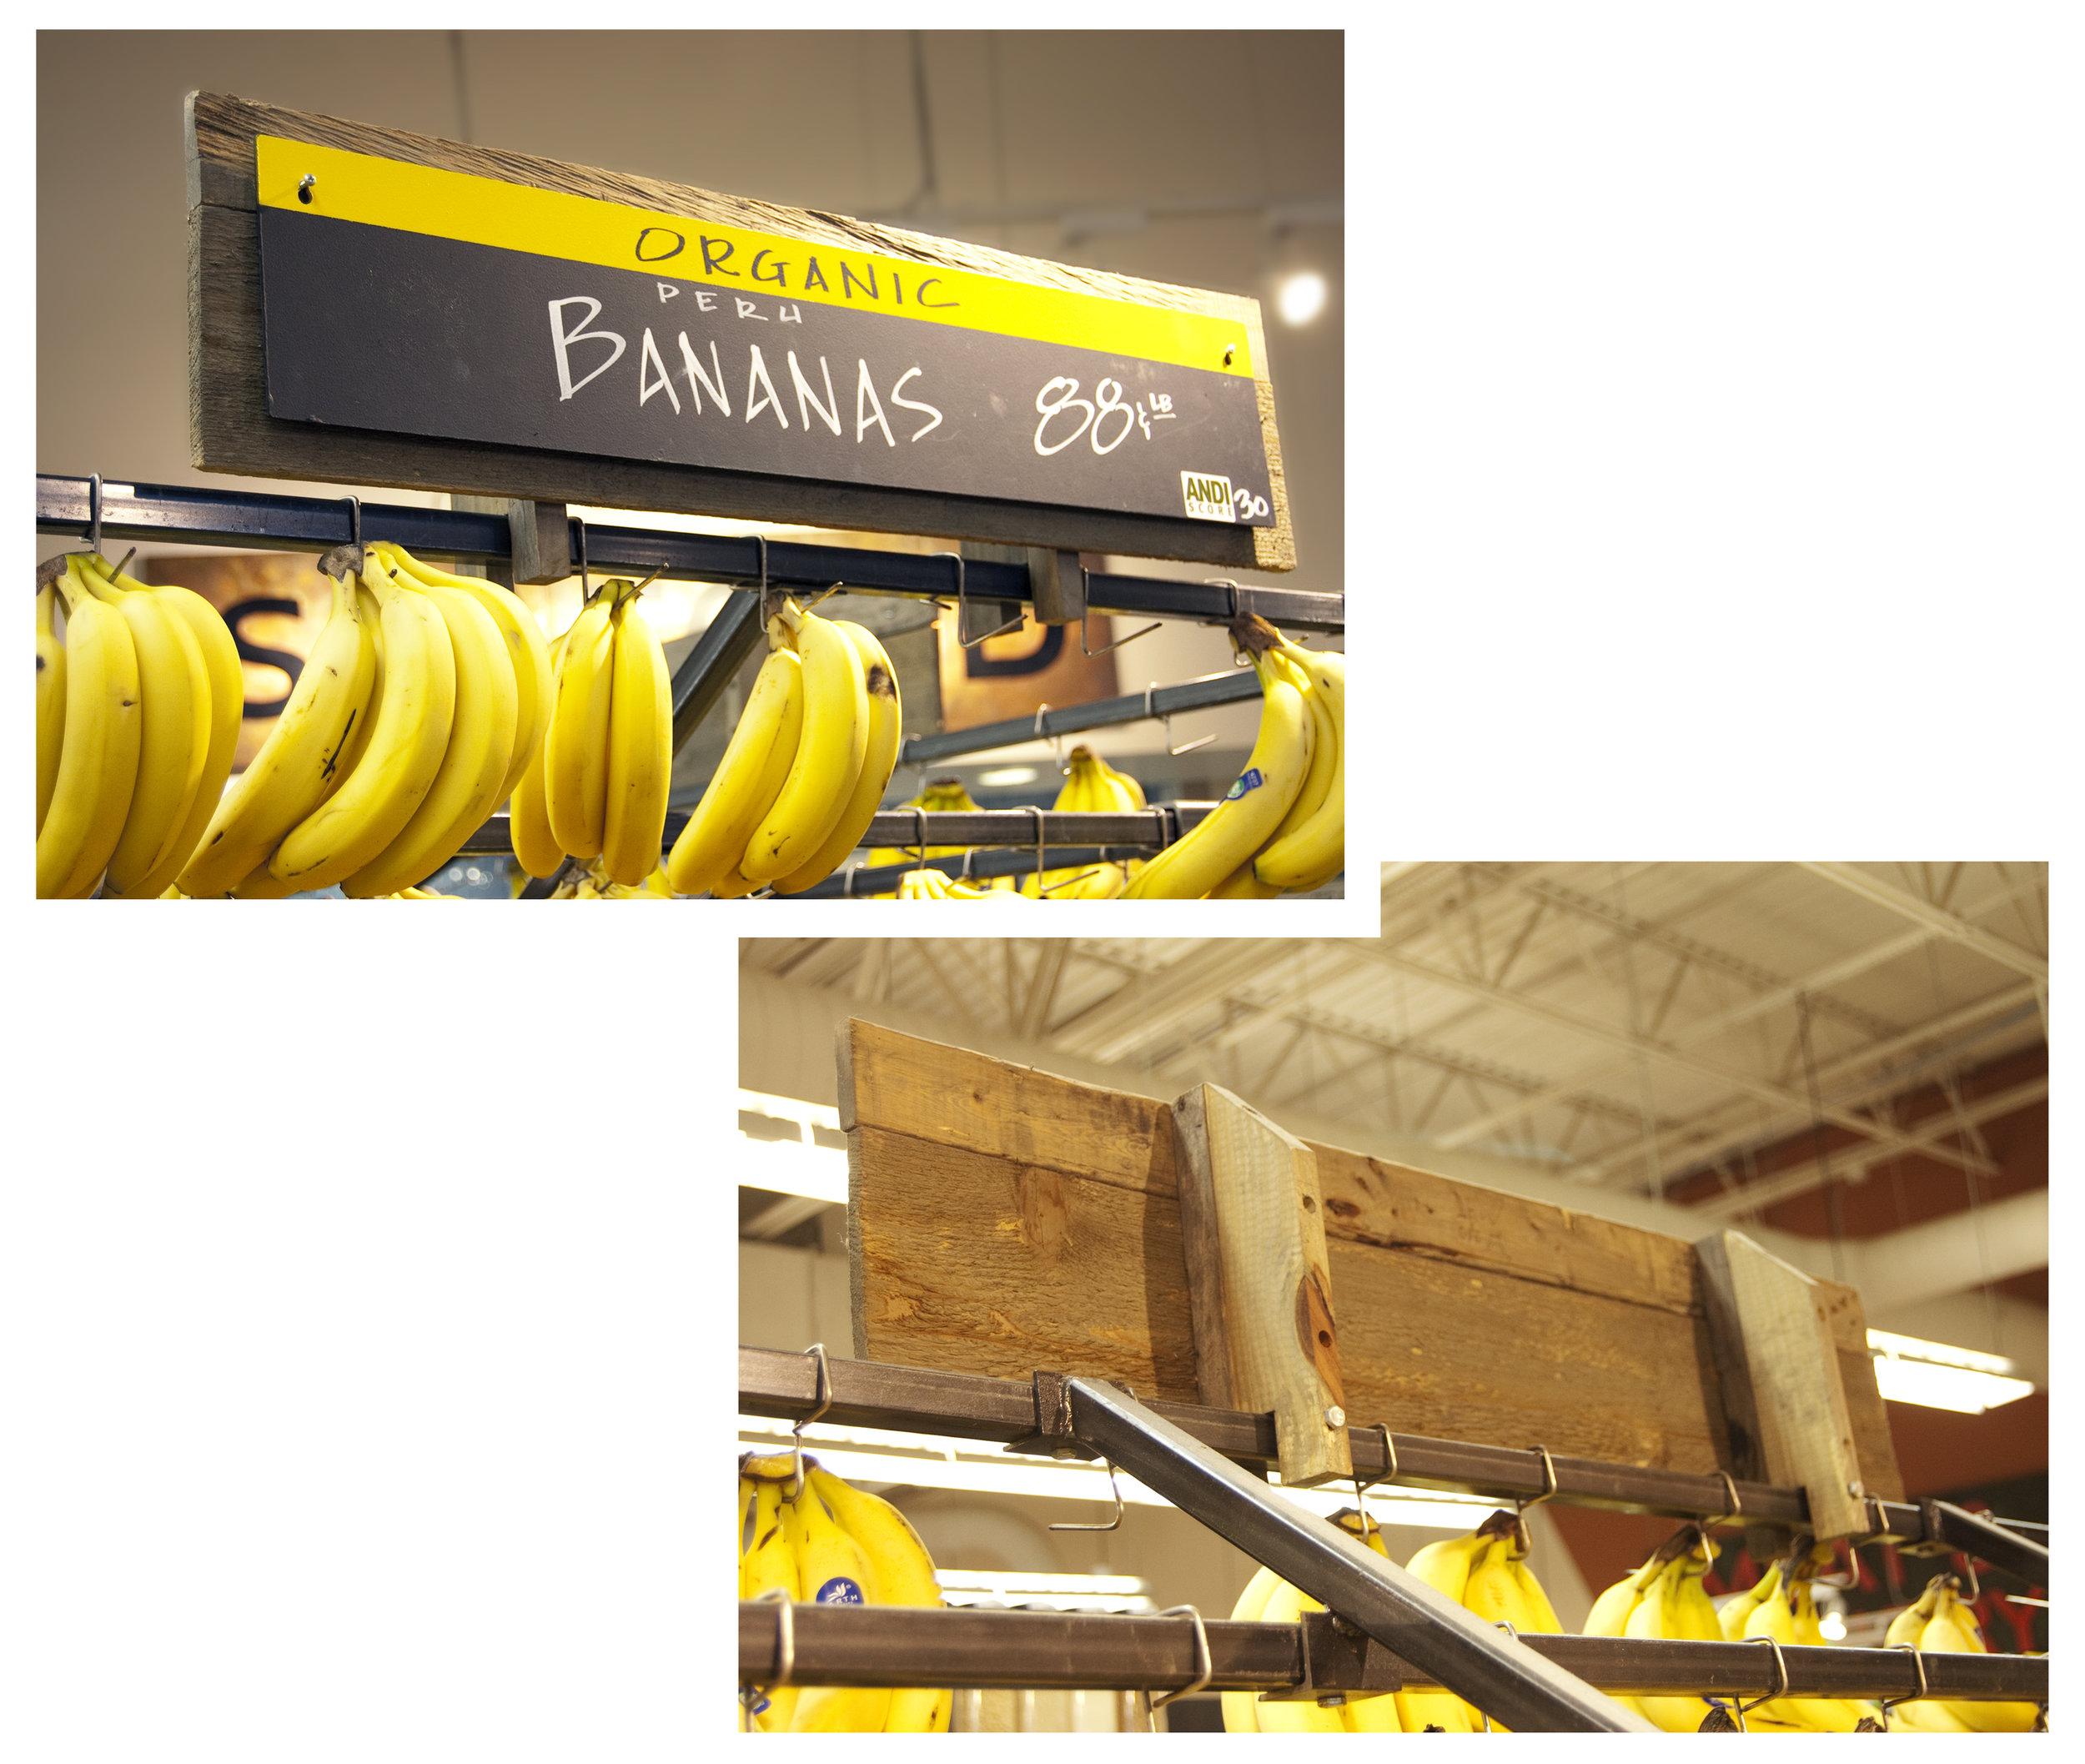 CB-banana-02.jpg